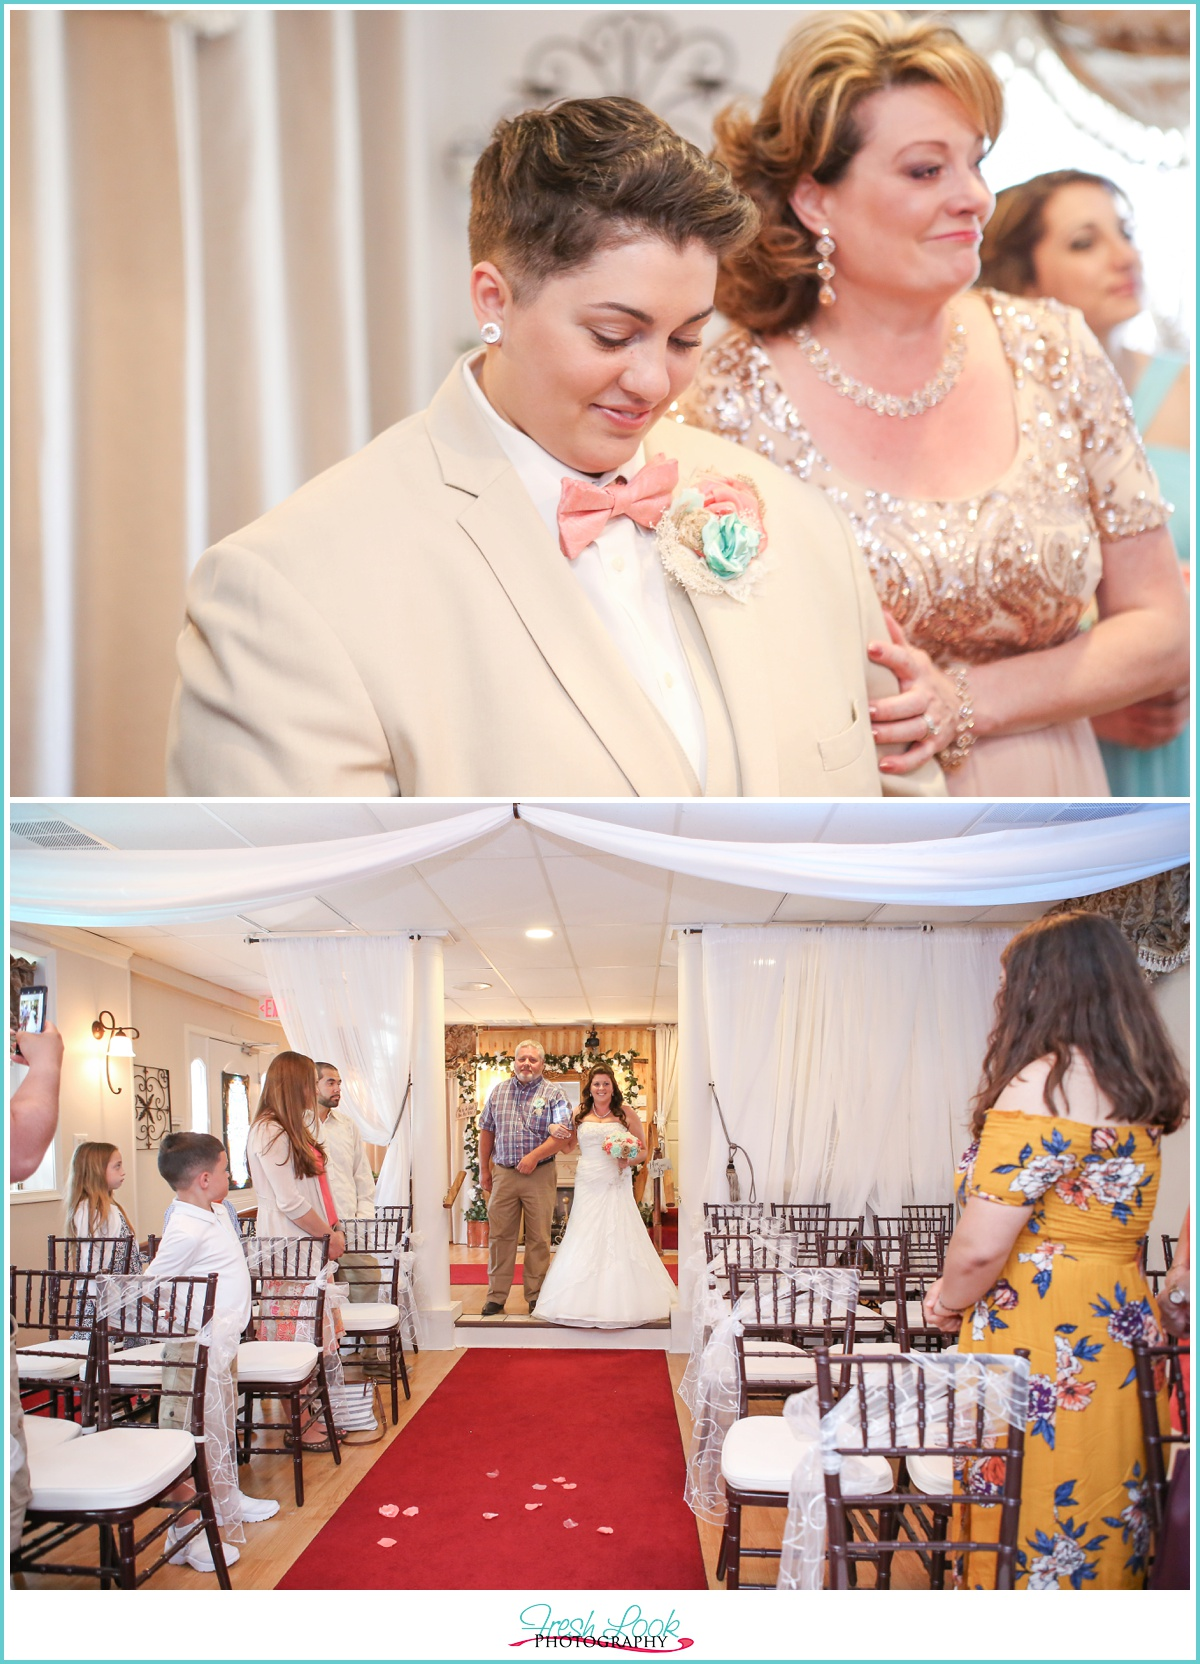 emotional brides during the wedding